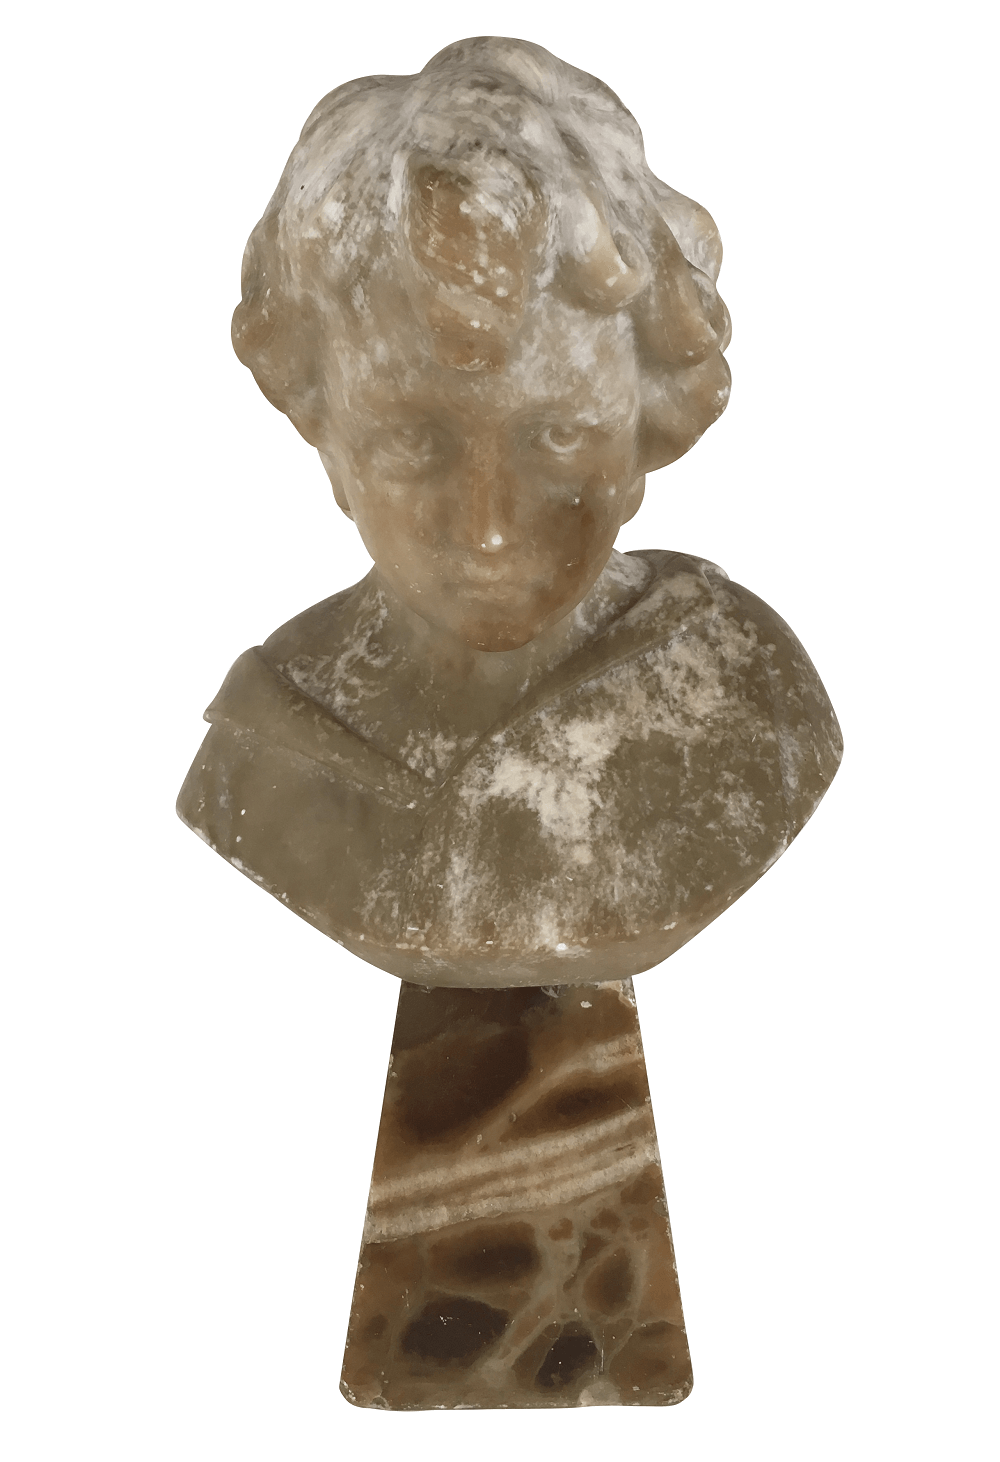 Antiga Escultura Busto Em Alabastro Assinado